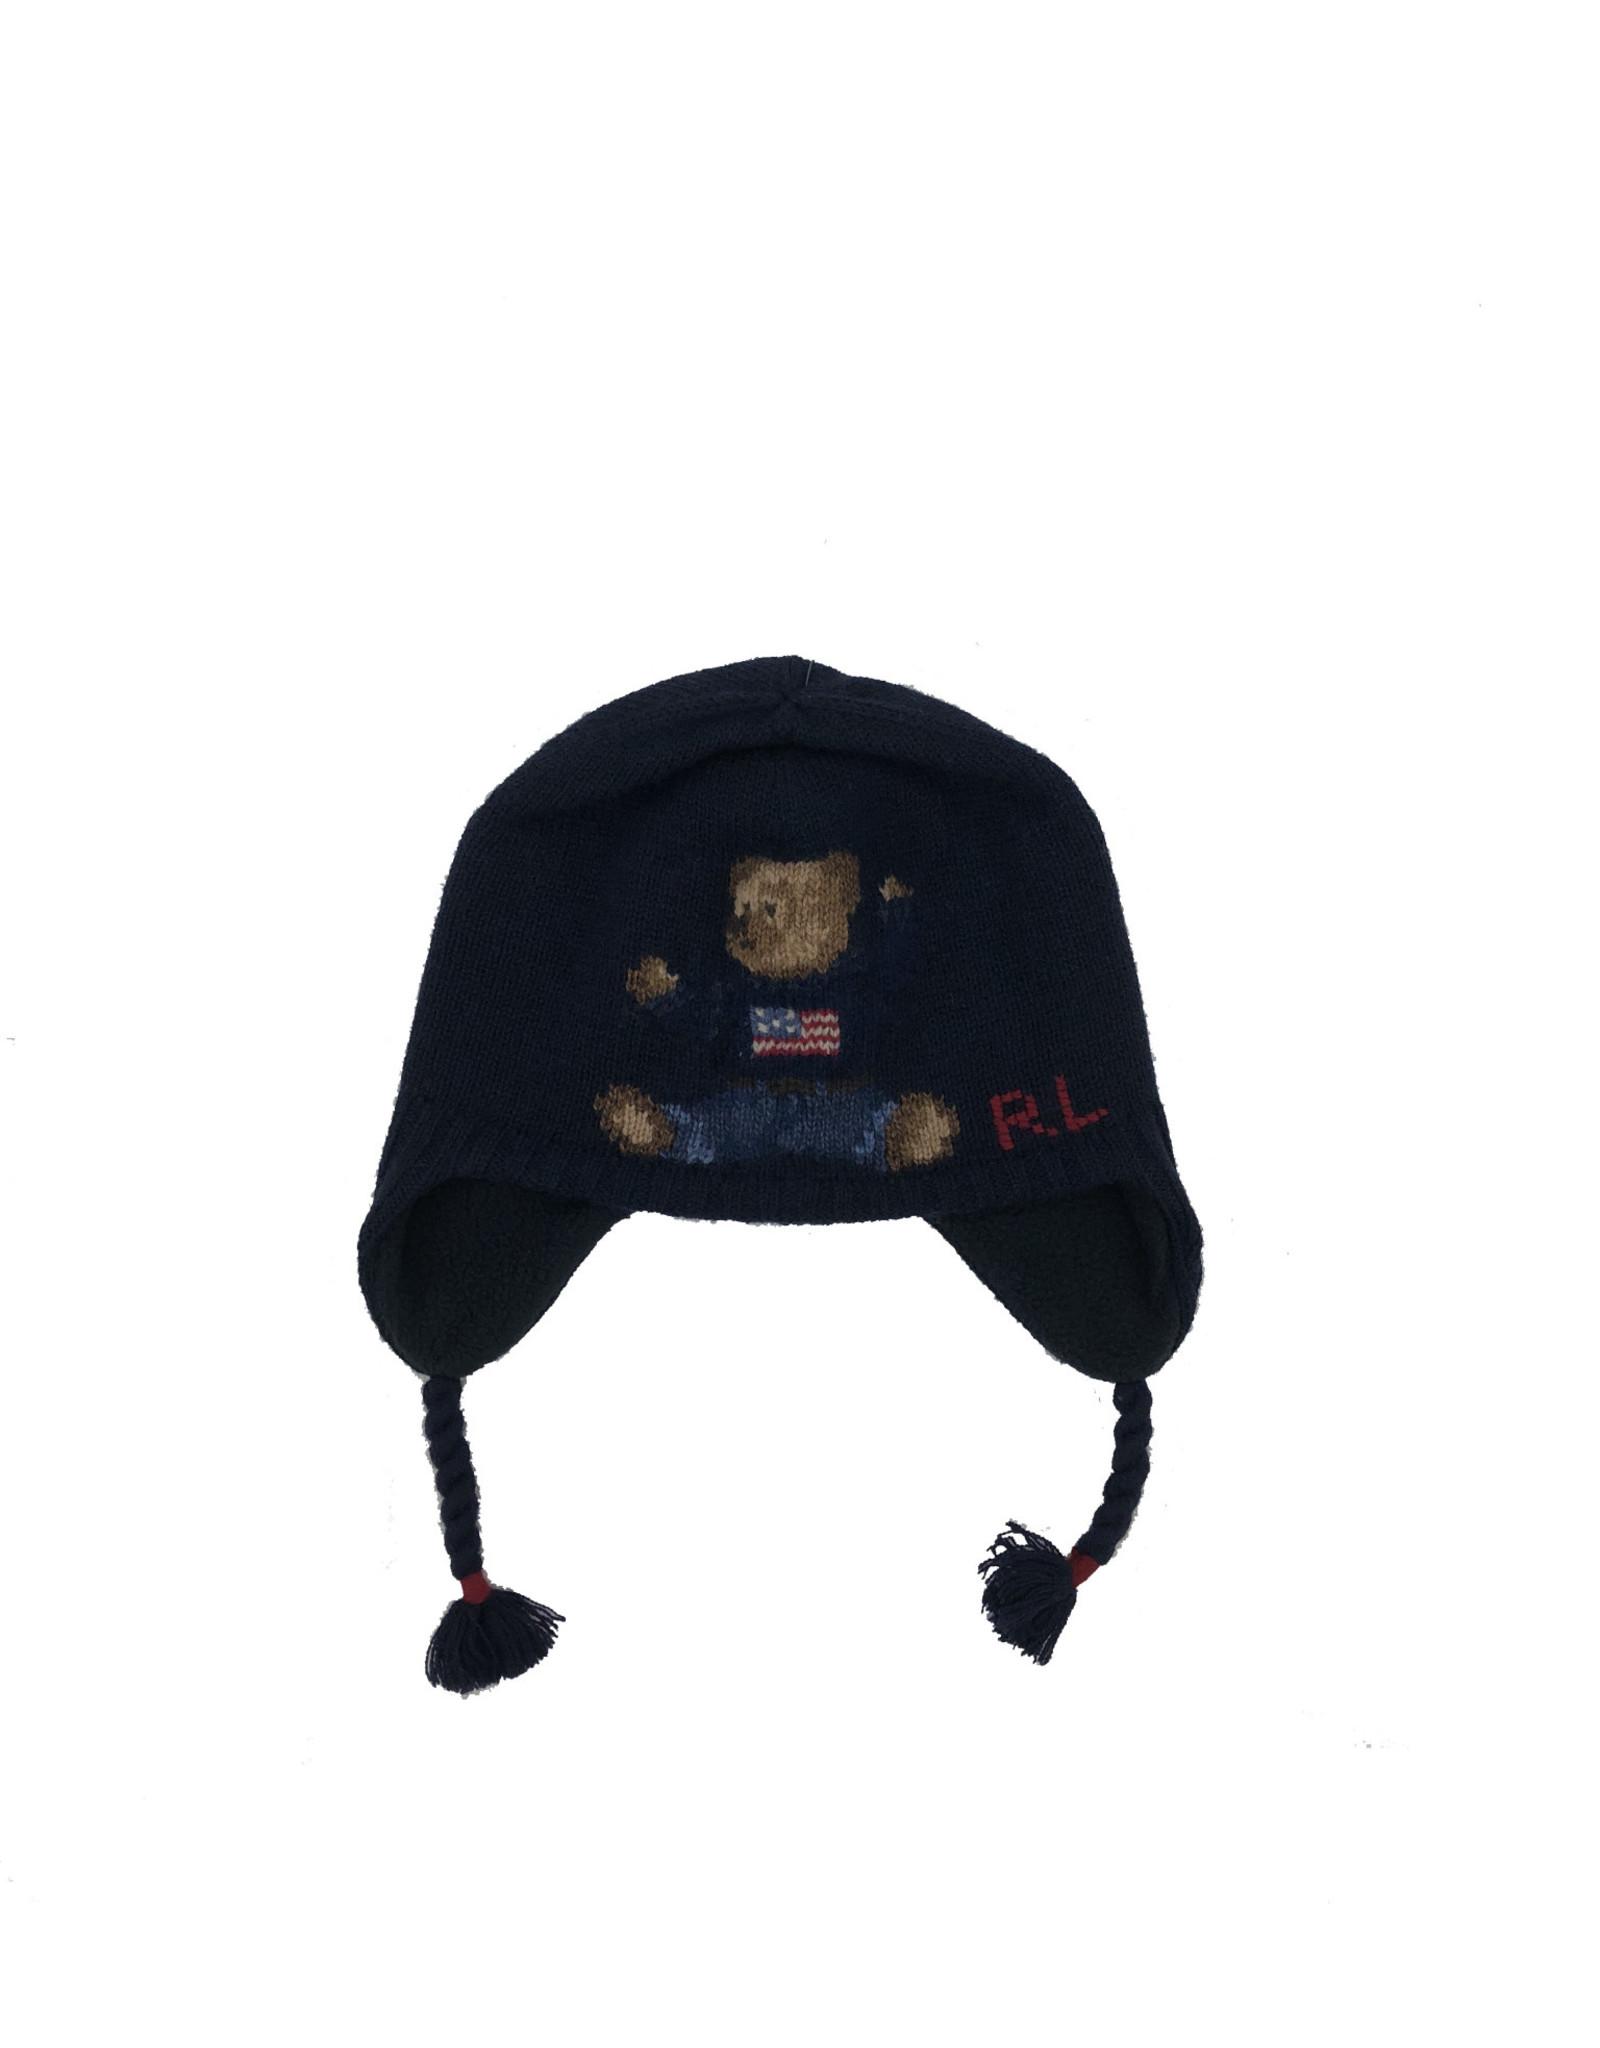 RALPH LAUREN Bear Earflap-Apparel Accessories-Hat Navy